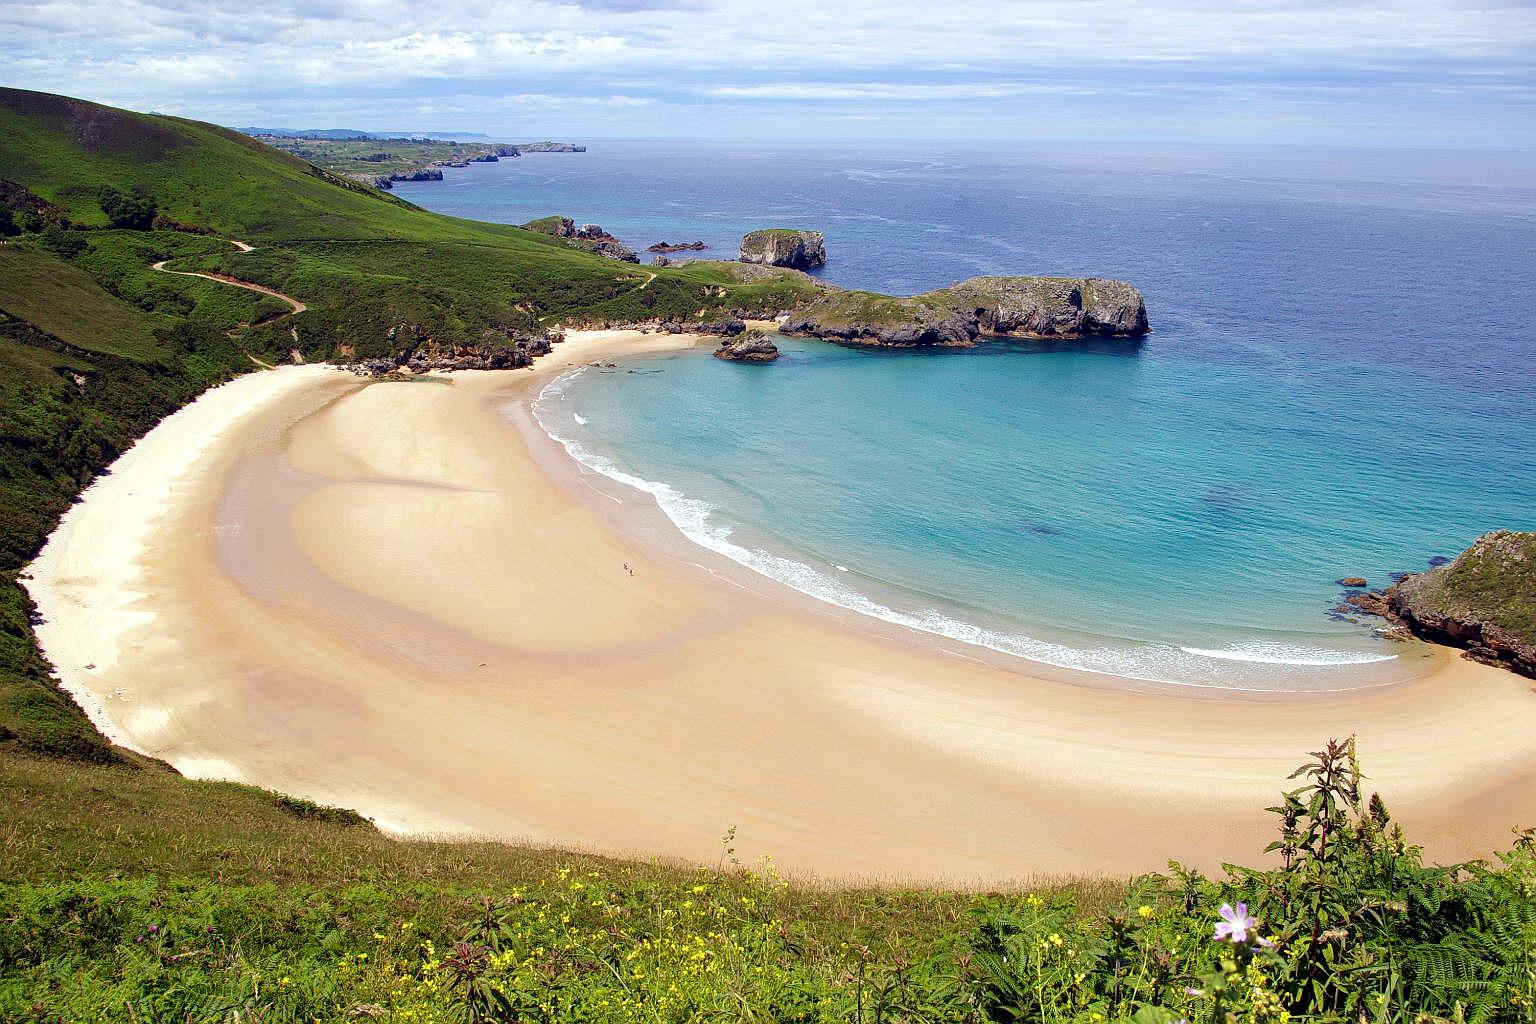 Foto playa Torimbia. Playa de Torimbia, Niembro, LLanes, Asturias